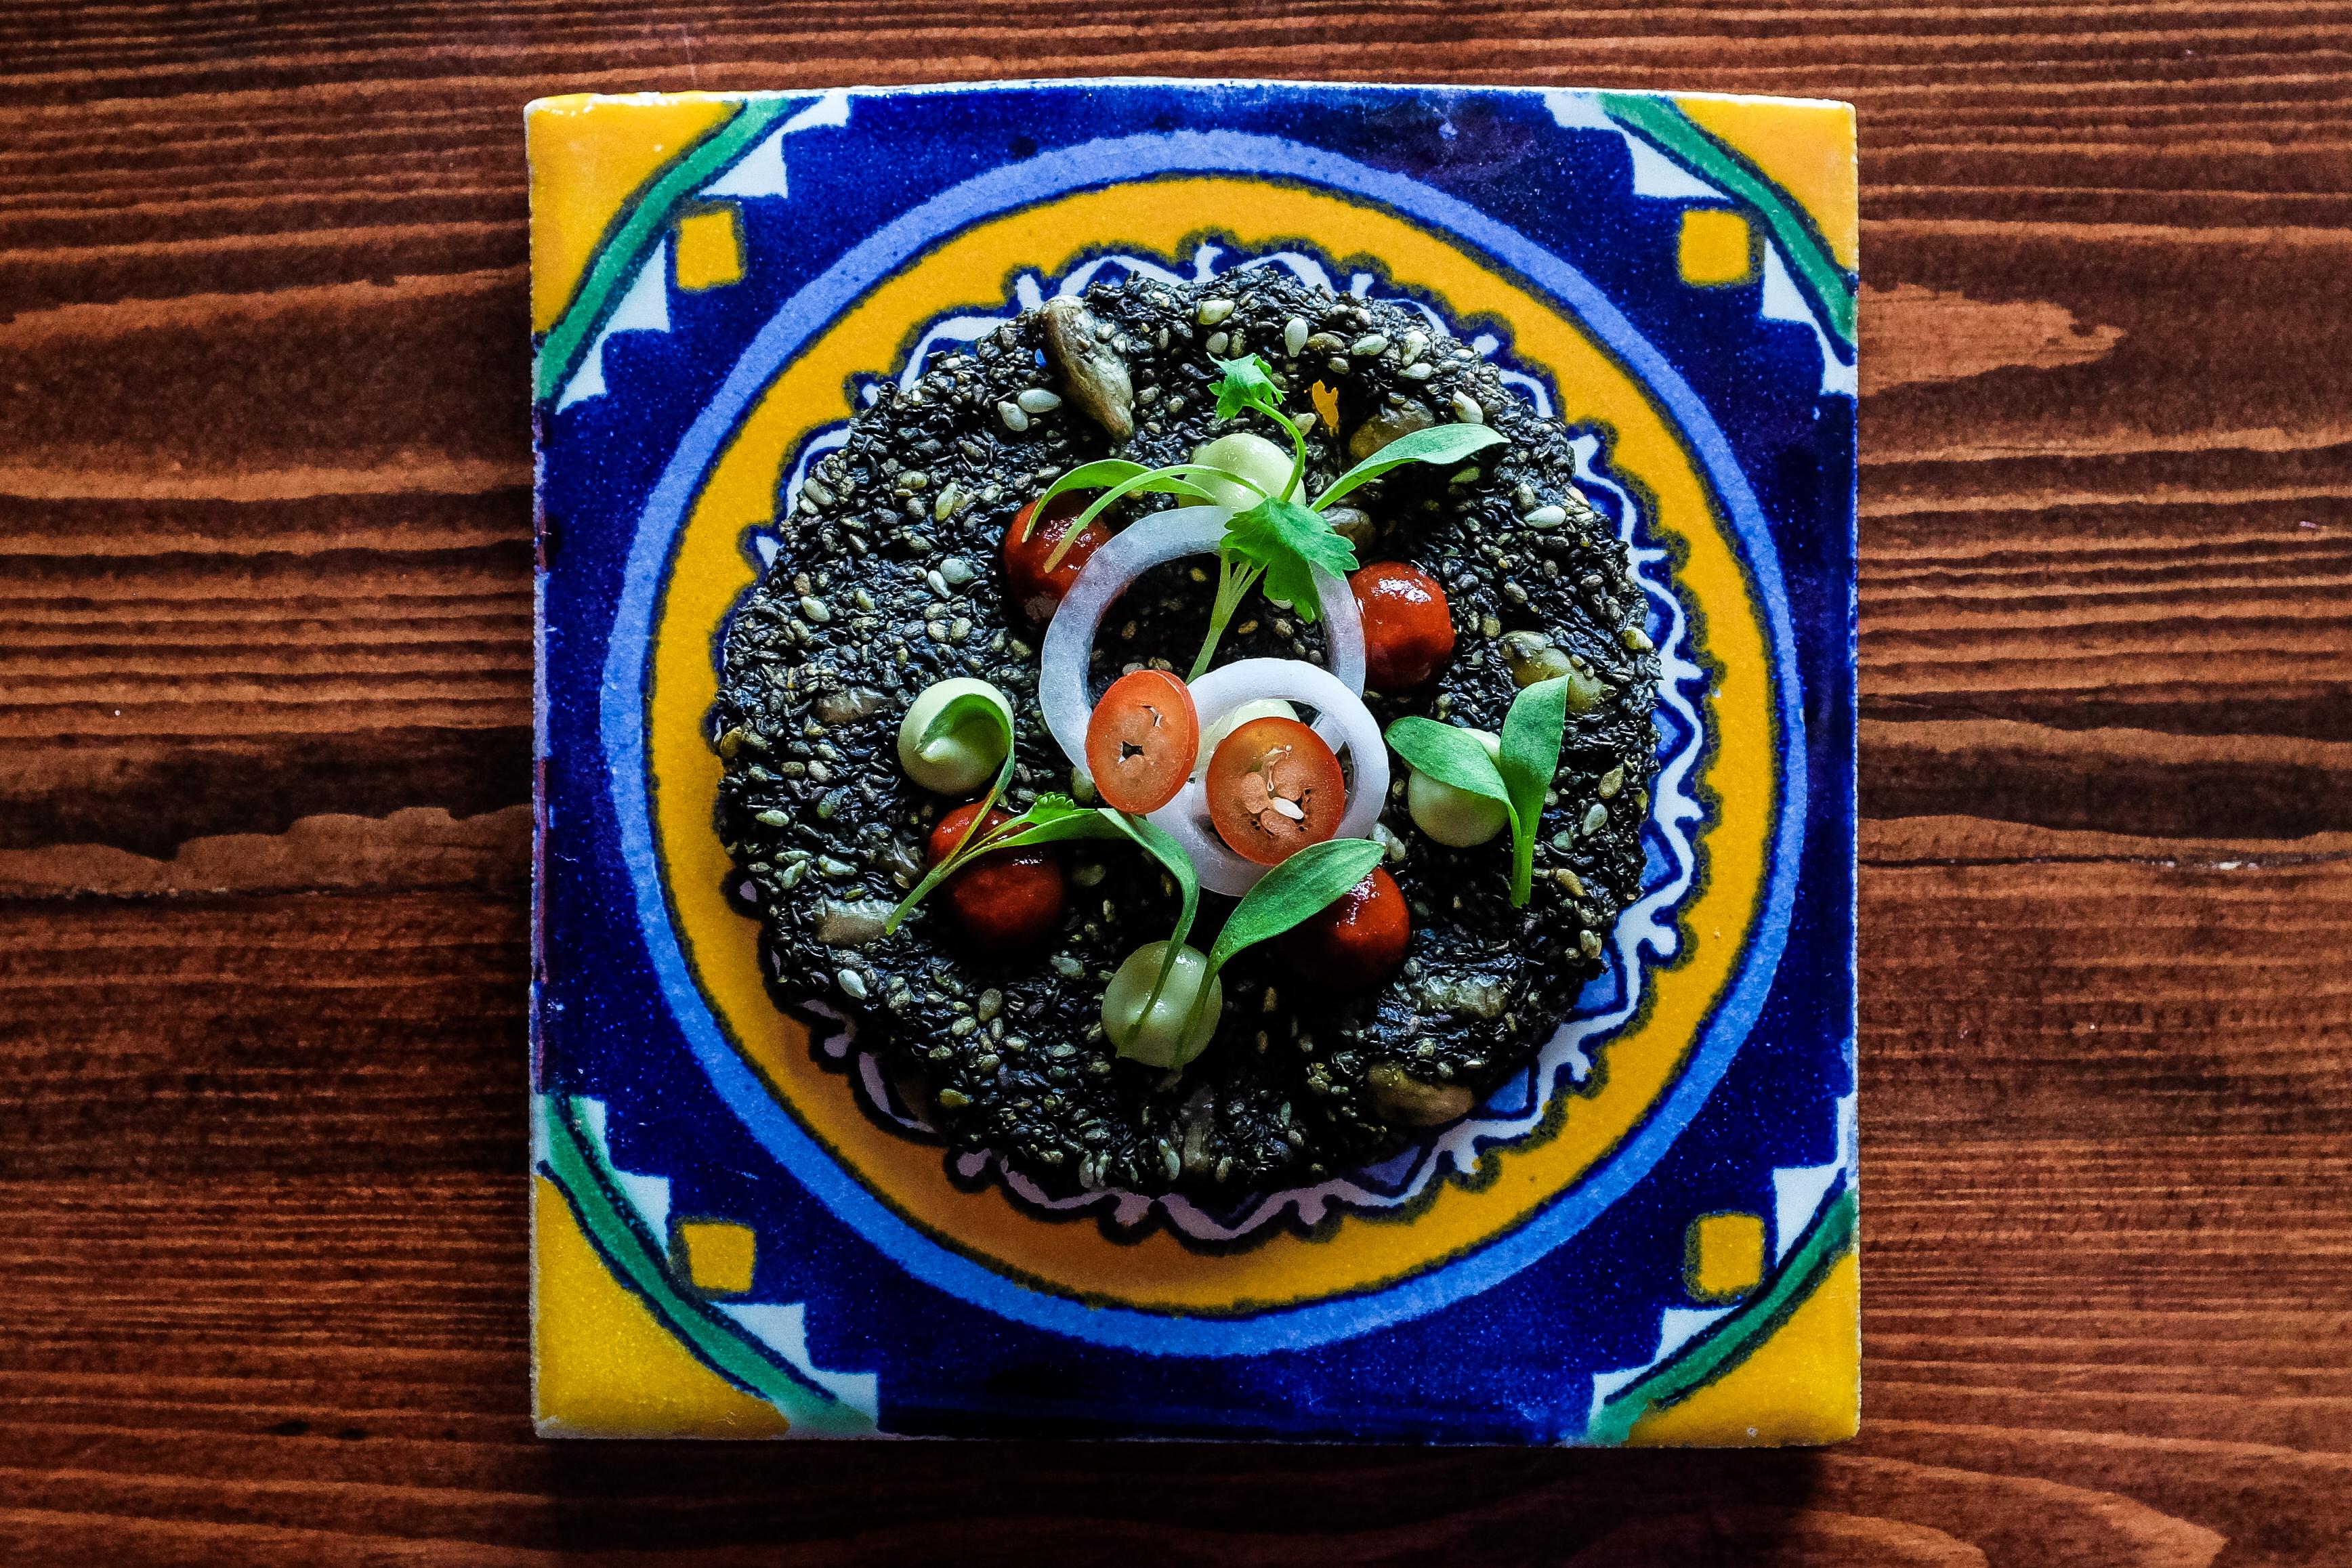 Chef of San Antonio Restaurant Mixtli Pleads No Contest to Assault Charge